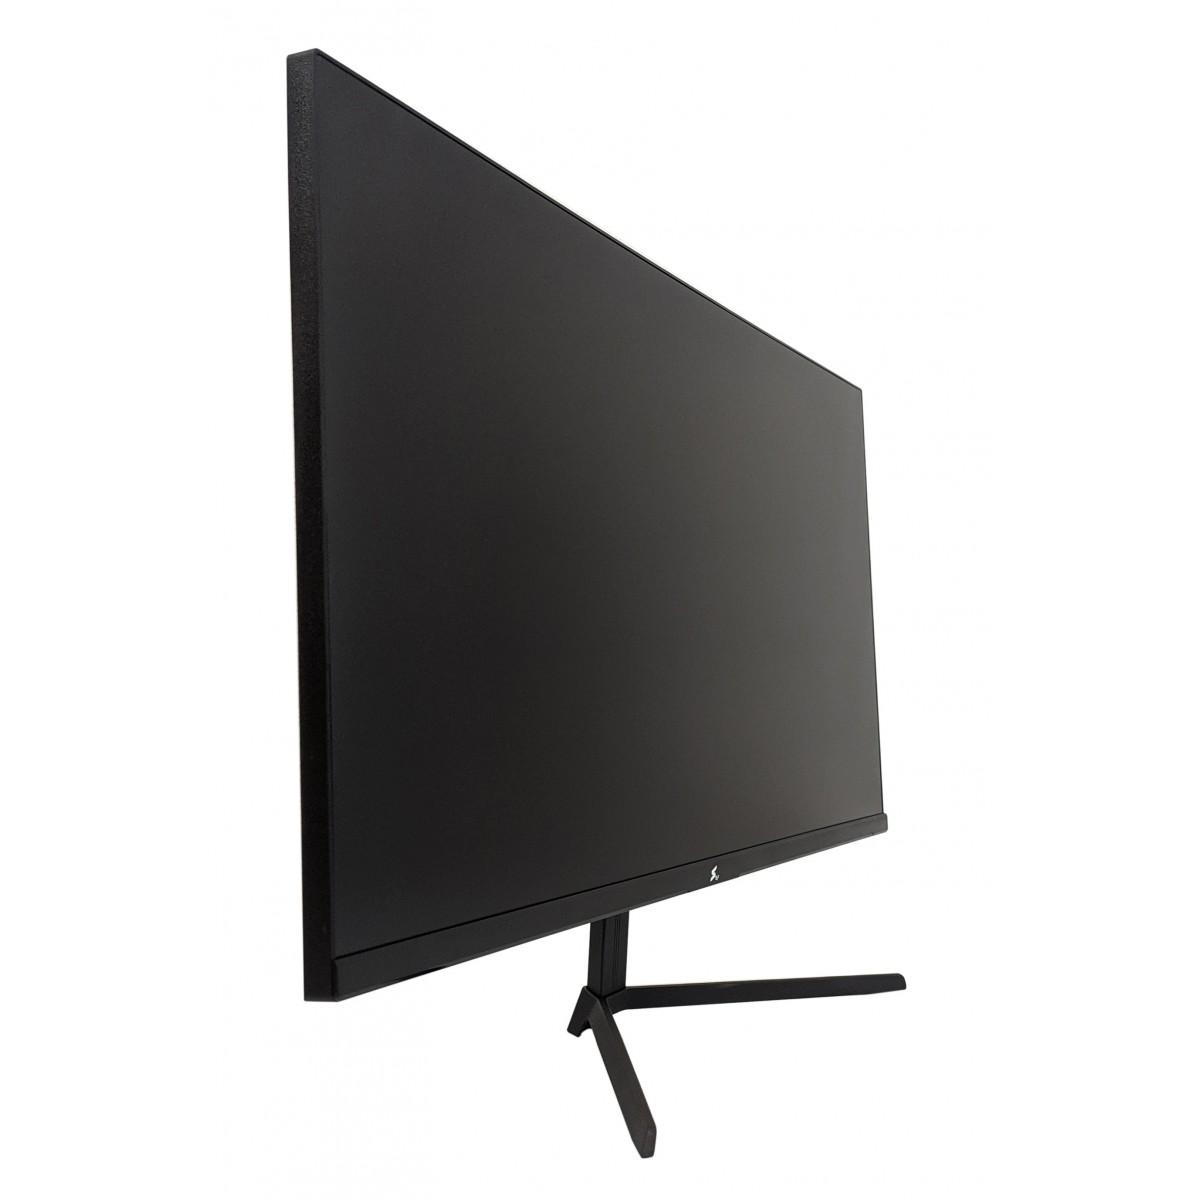 Monitor Gamer SuperFrame Vision, 24 Pol, Full HD, IPS, FreeSync, 1ms, 165Hz, HDMI/DP, SFV2409S